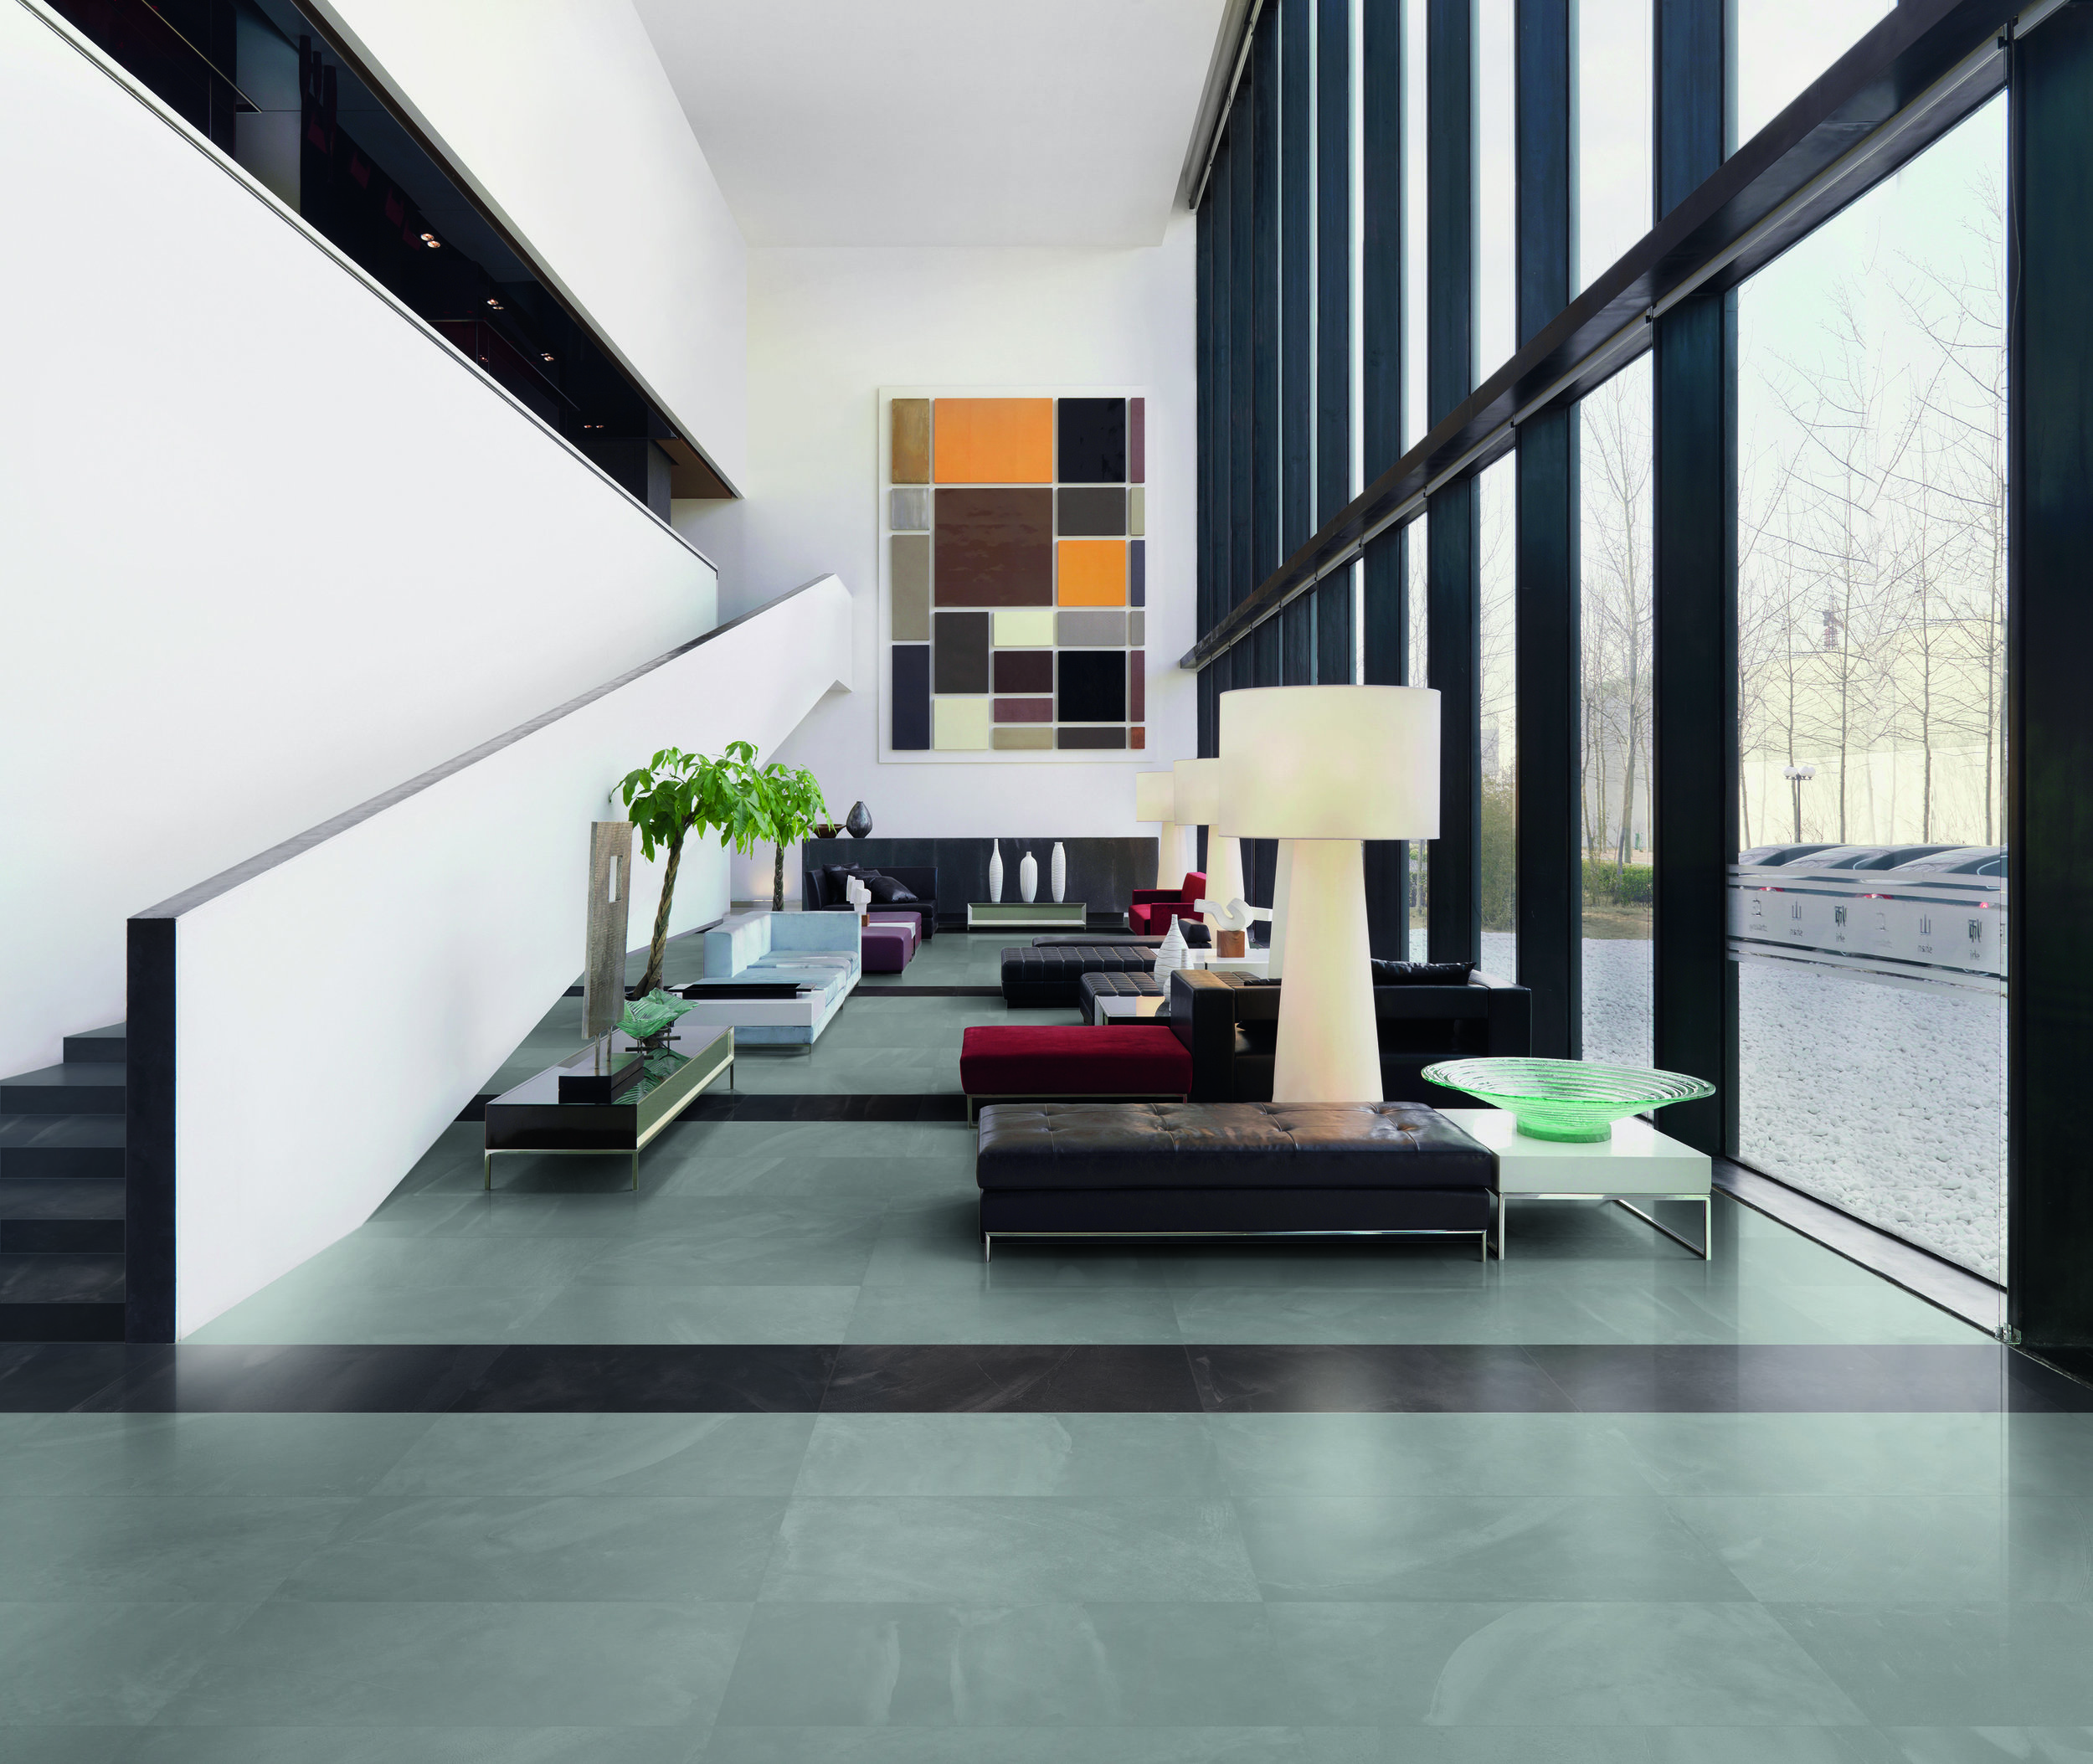 Architect London Smoke lap 40x80 amb divani con BLACK_SCURO.jpg